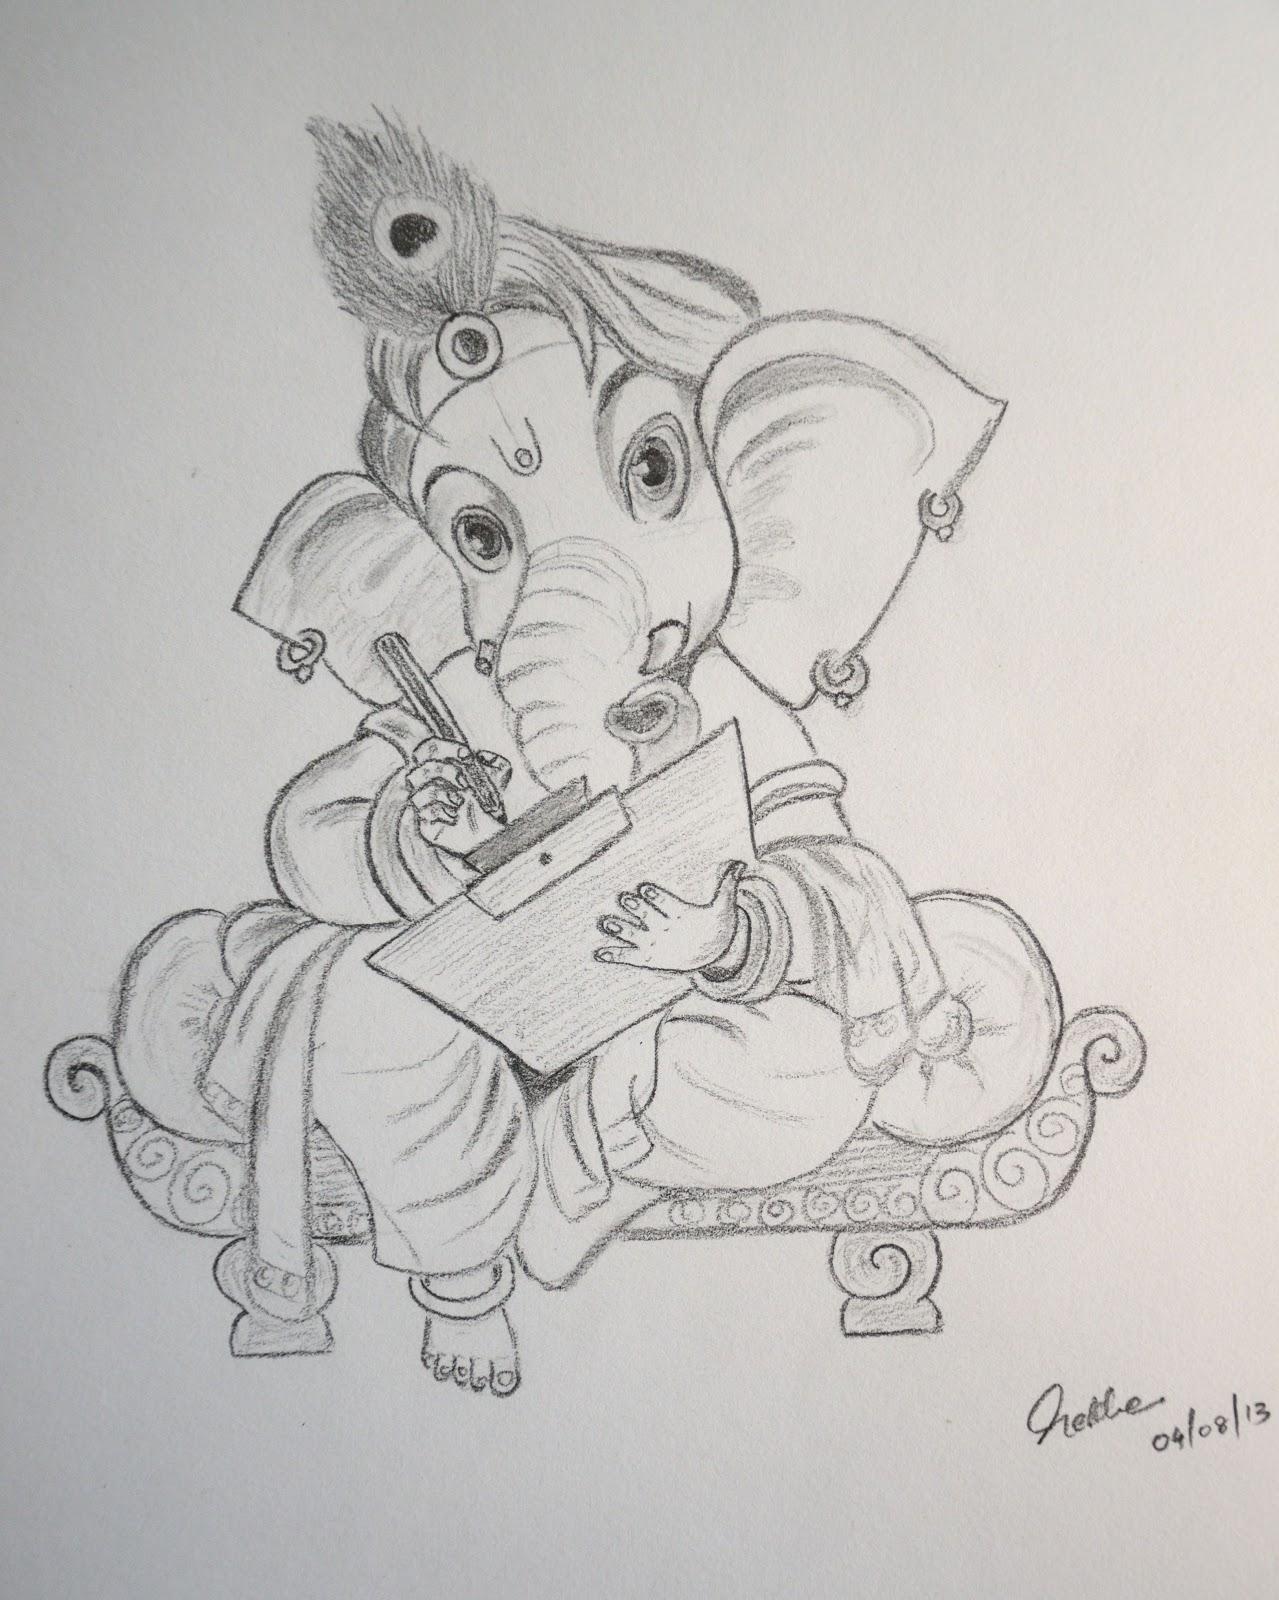 Easy Pencil Drawings Of Lord Ganesha Pencildrawing2019